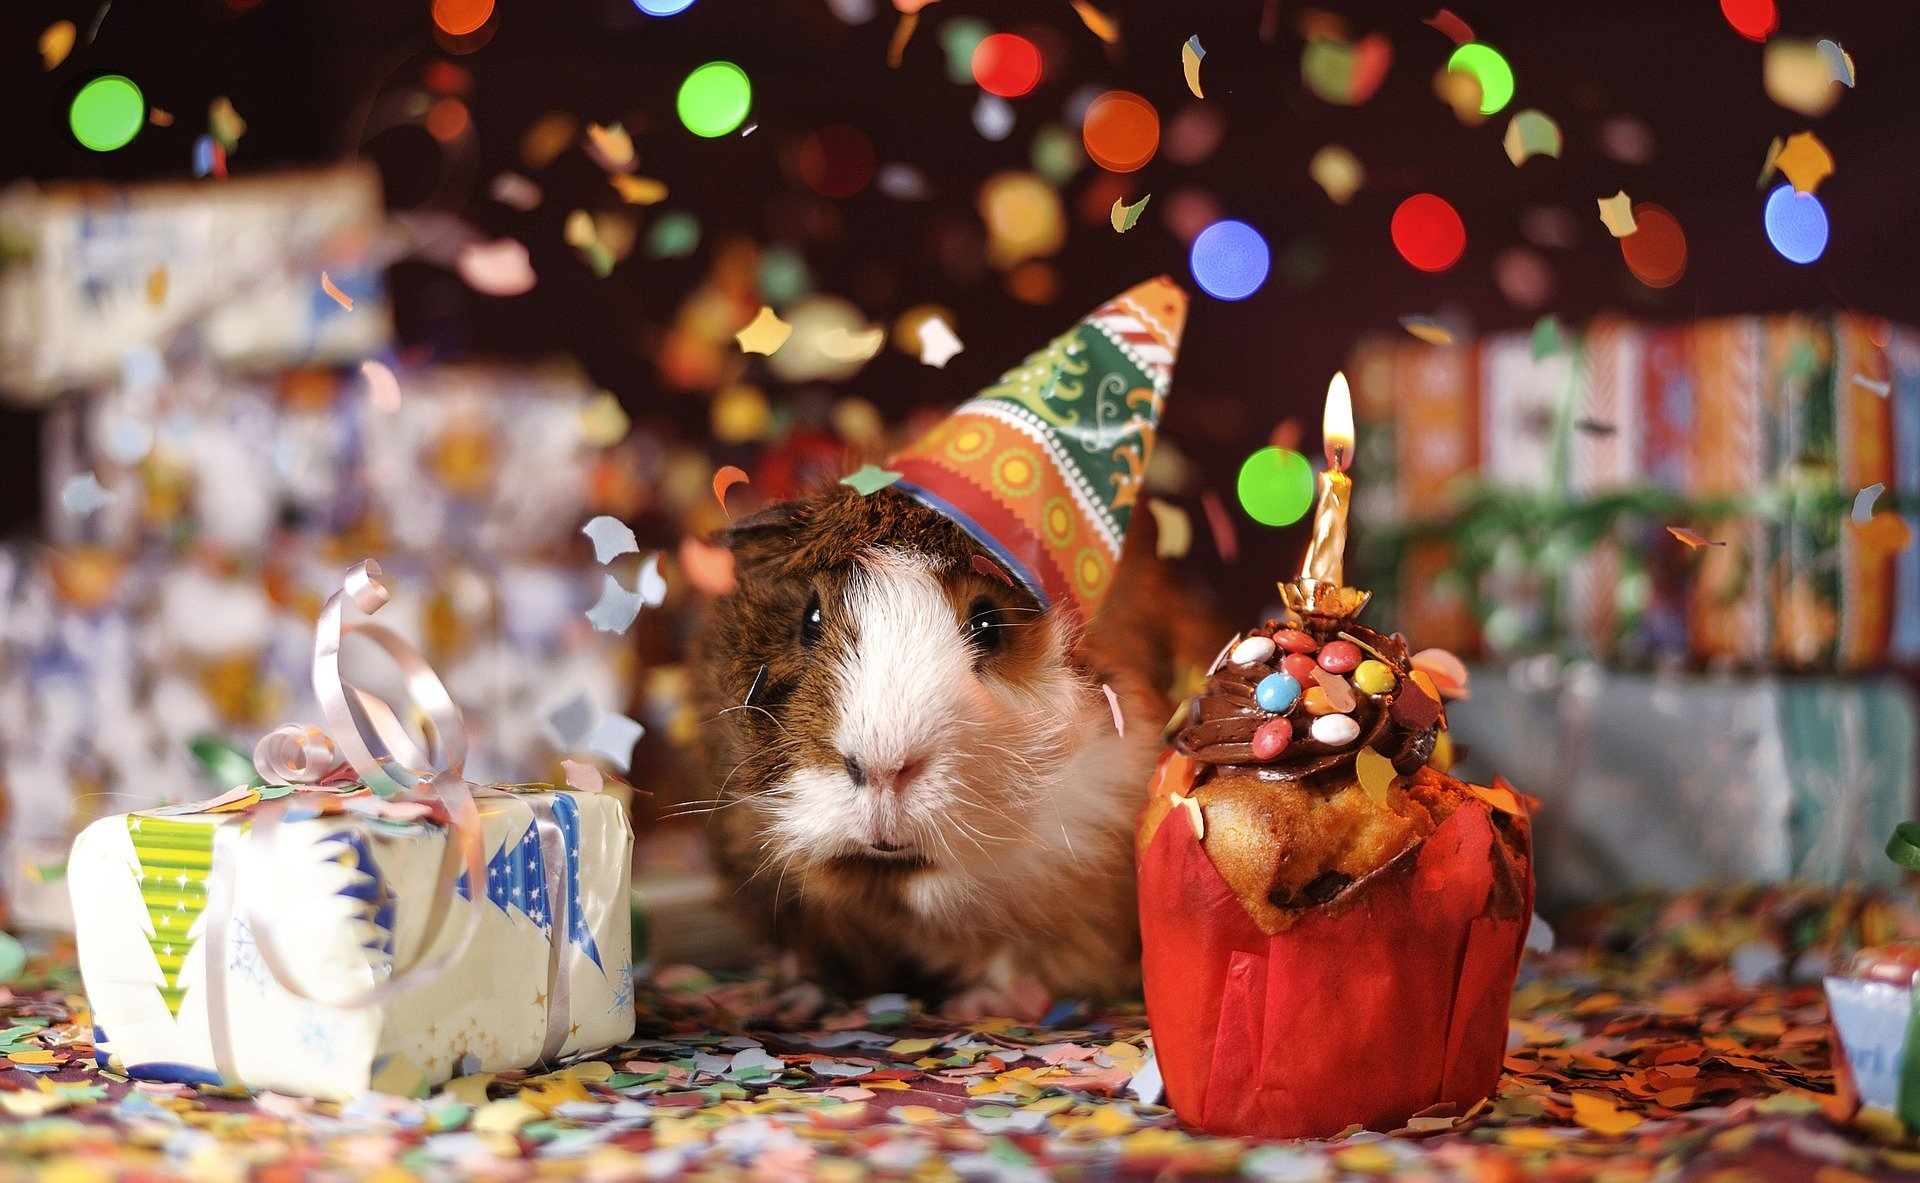 Wish A Happy Birthday To Someone Celebrating Their Birthday During The Coronavirus Shutdown Oxford Mail